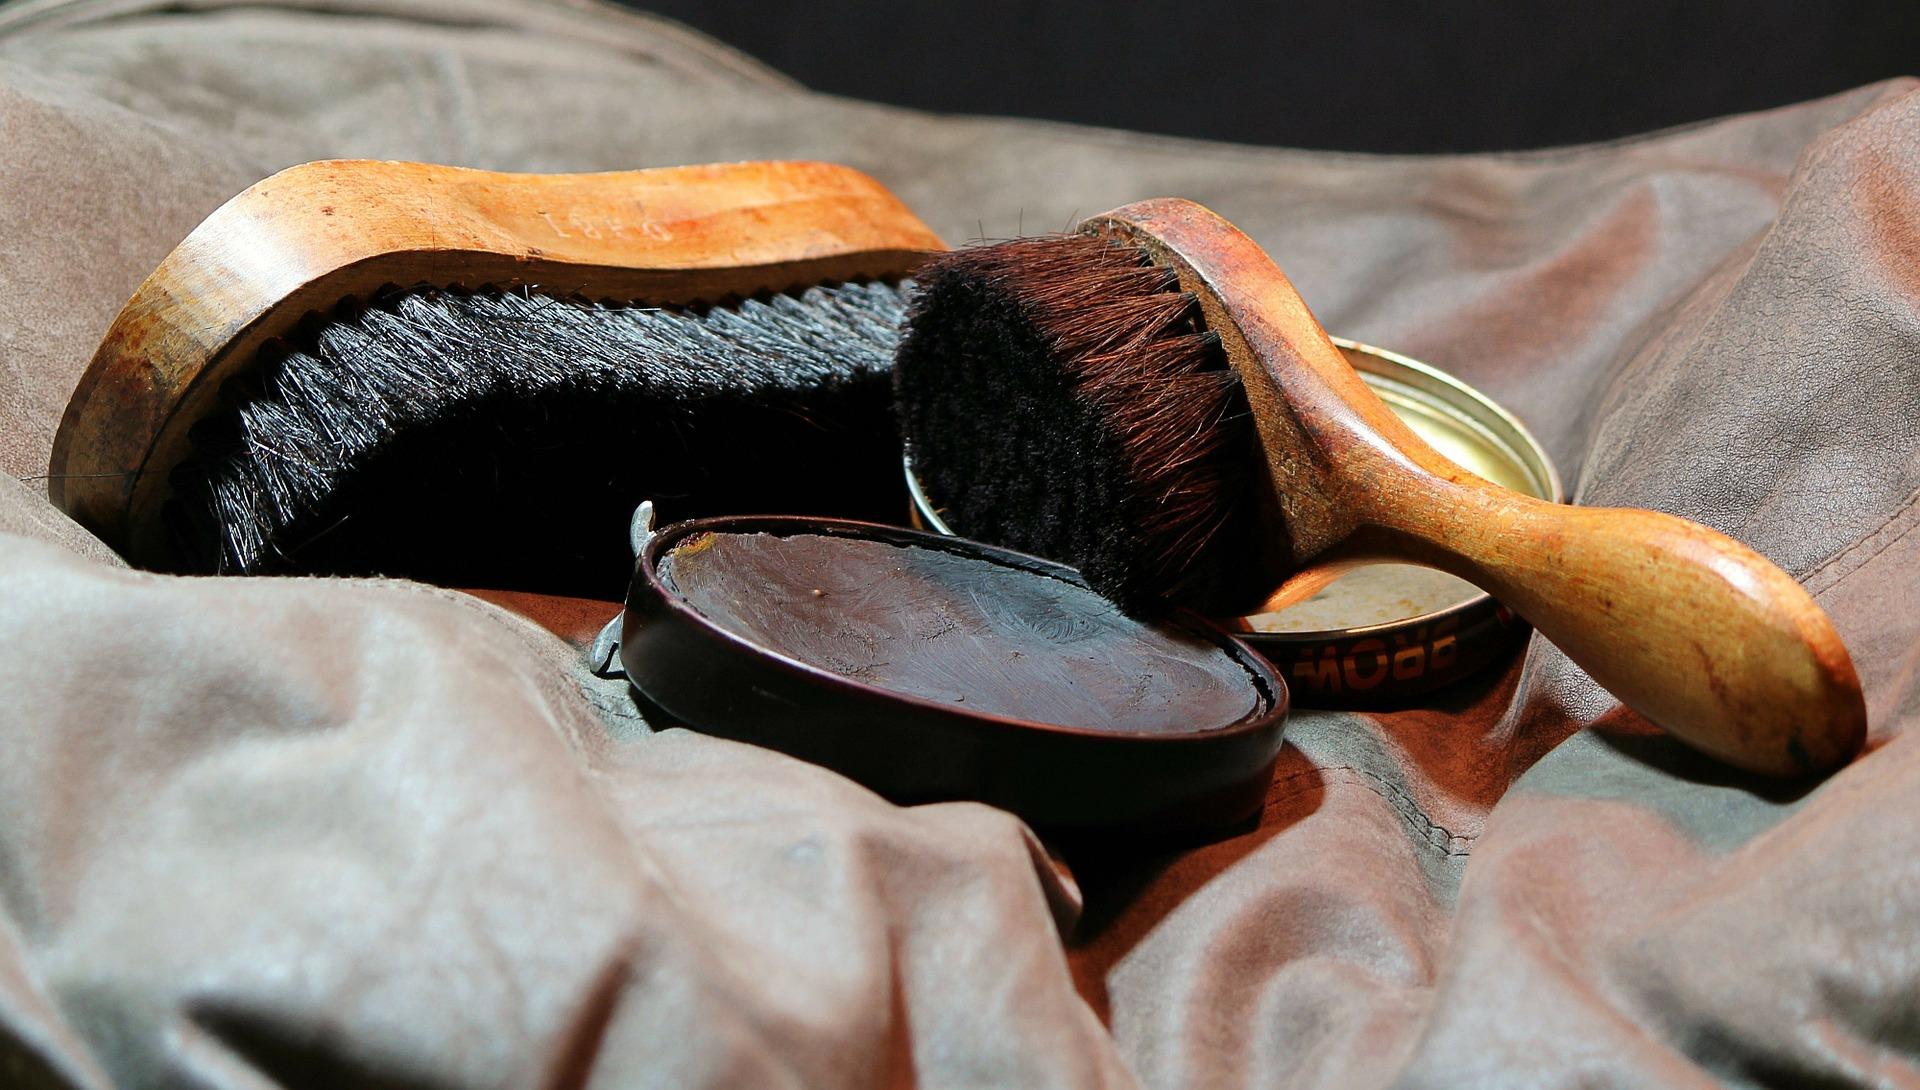 Schuhe putzen - Pflege - Bürsten